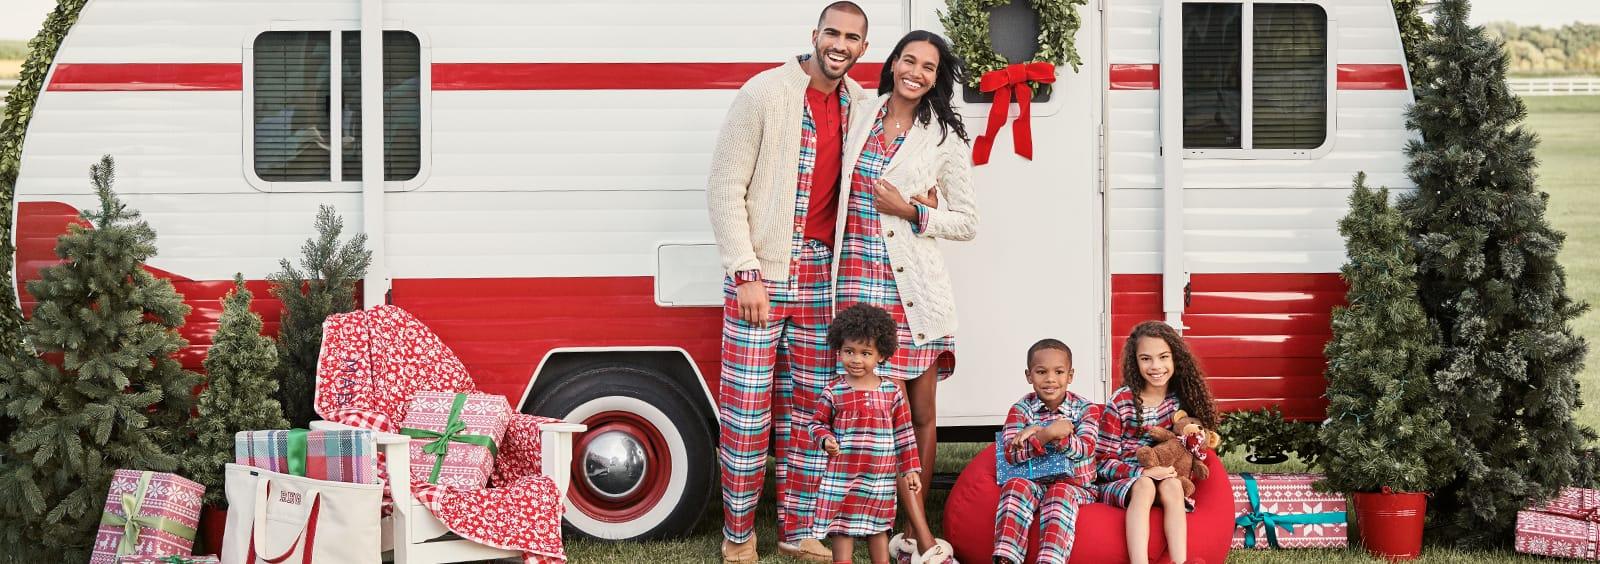 Matching Family Pajamas You Need This Holiday Season | Lands' End